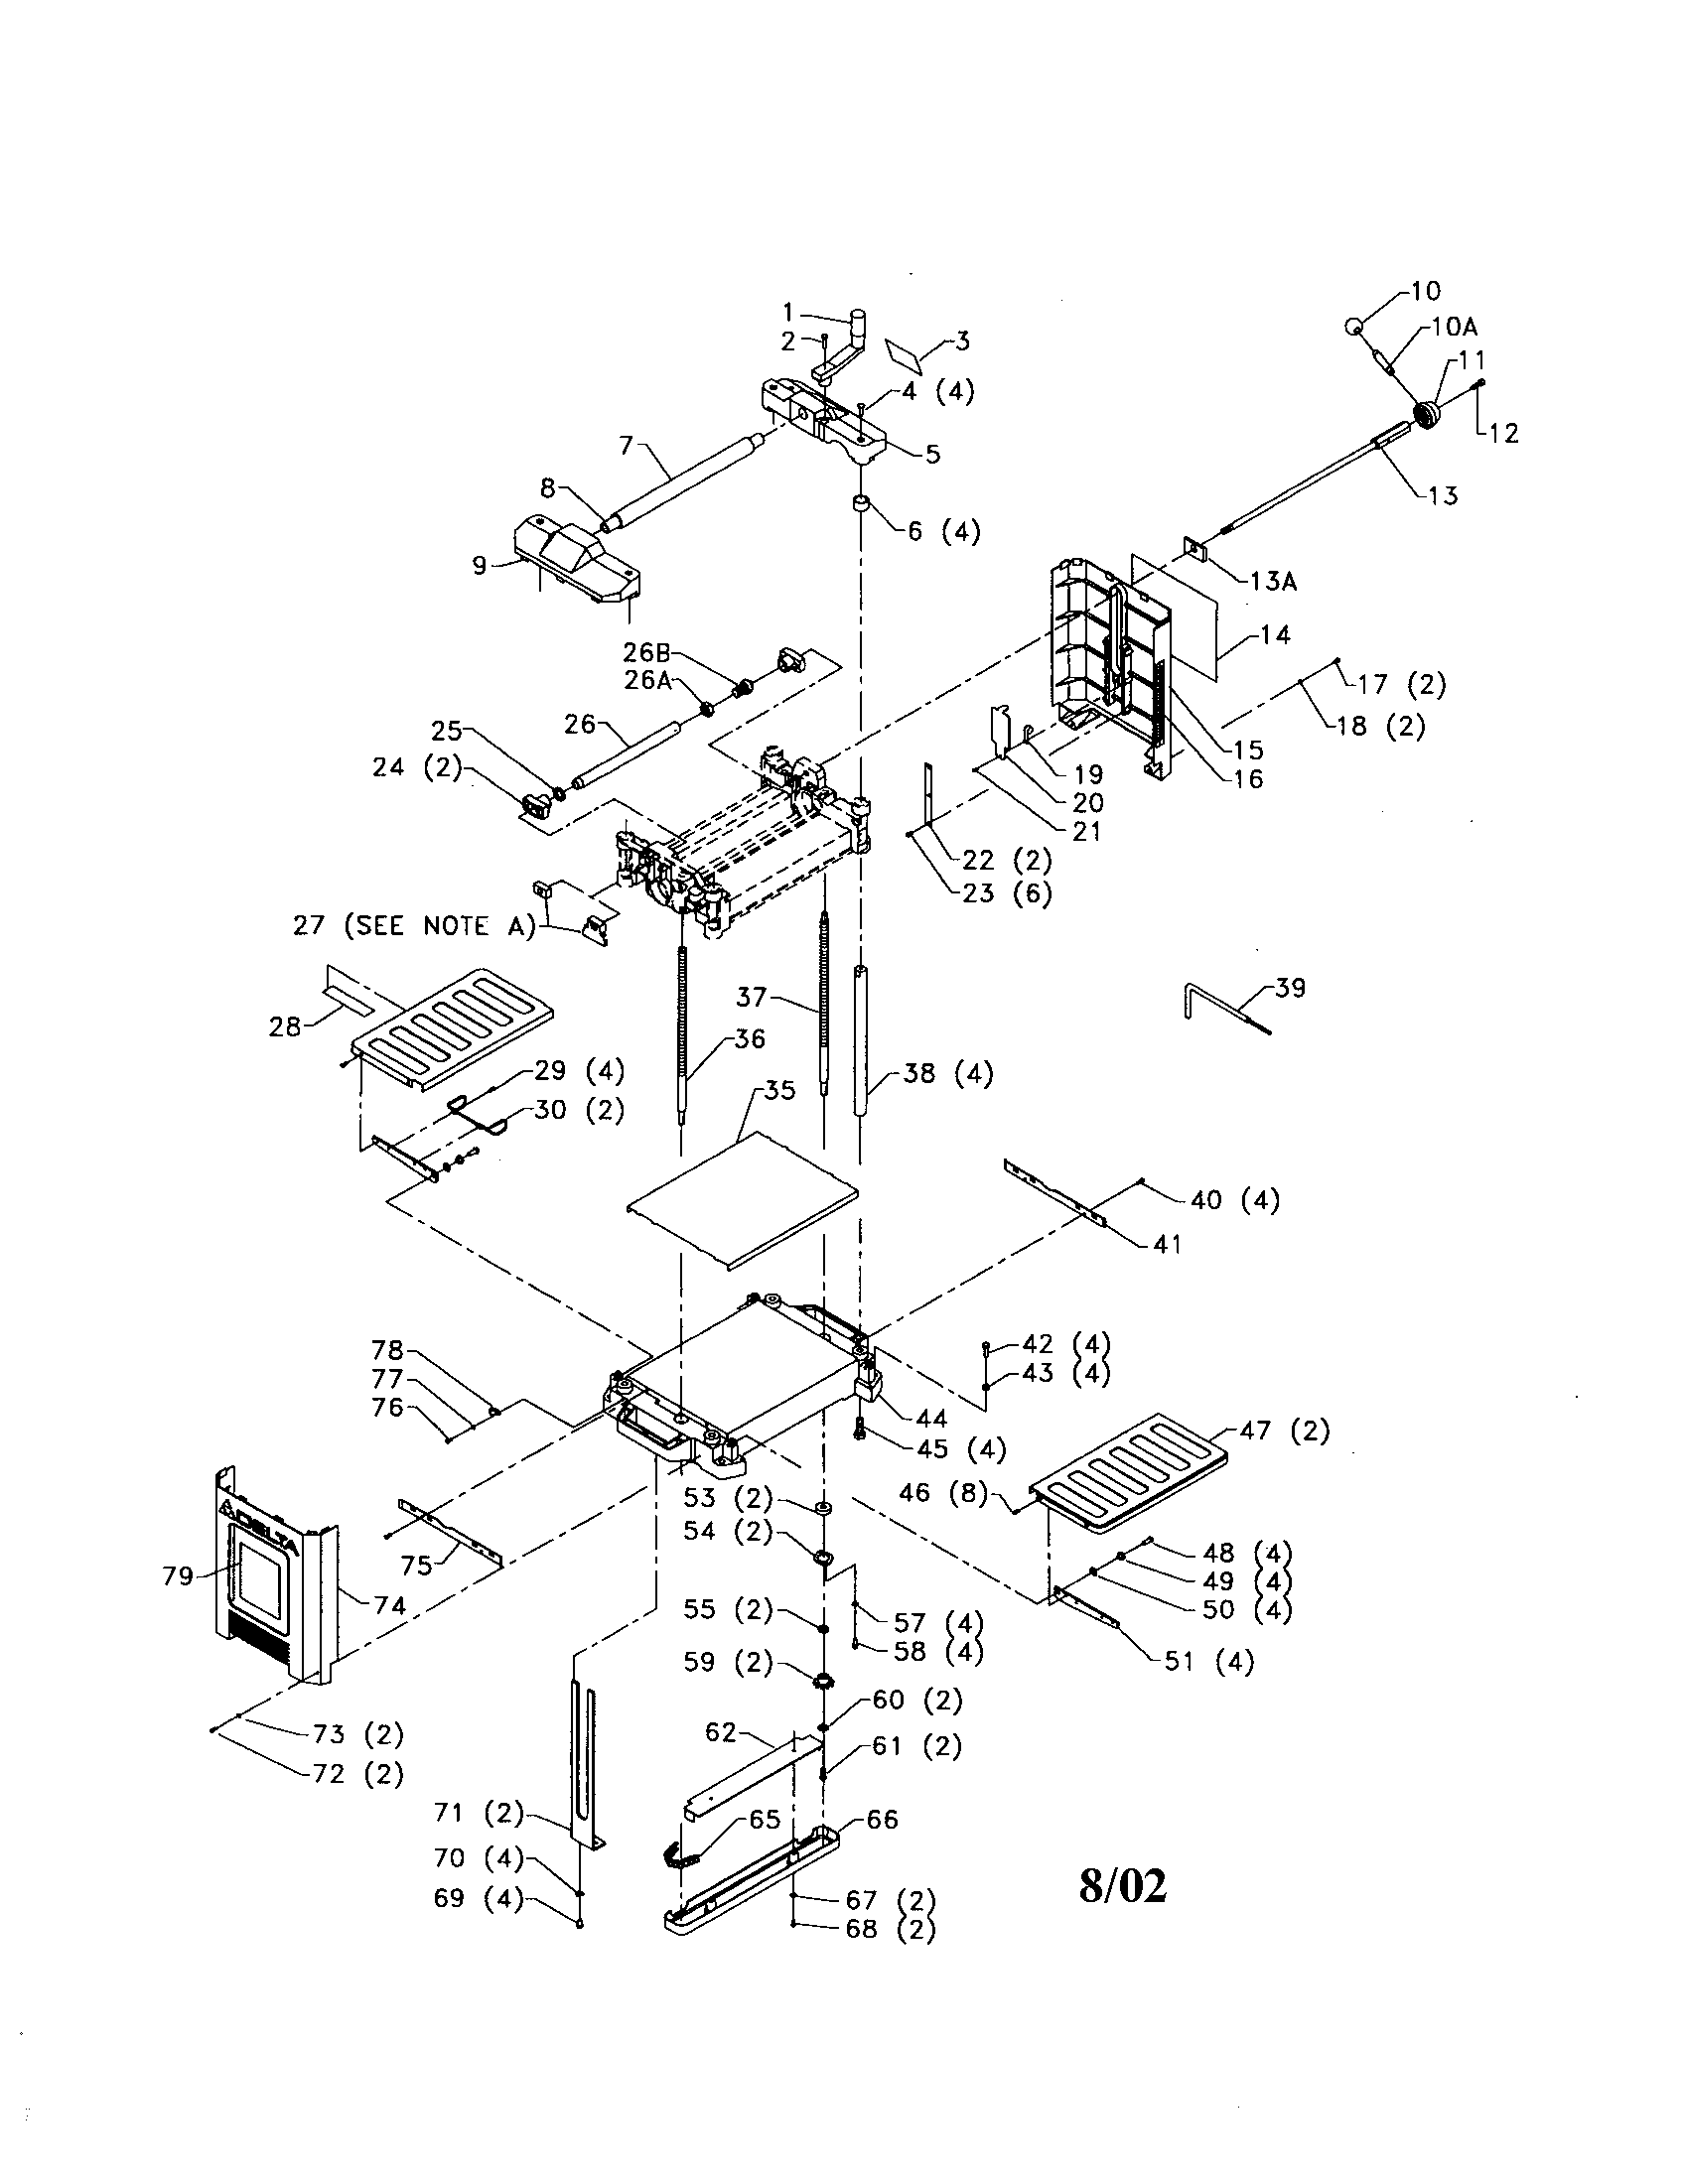 delta wiring diagram for 22650 planer